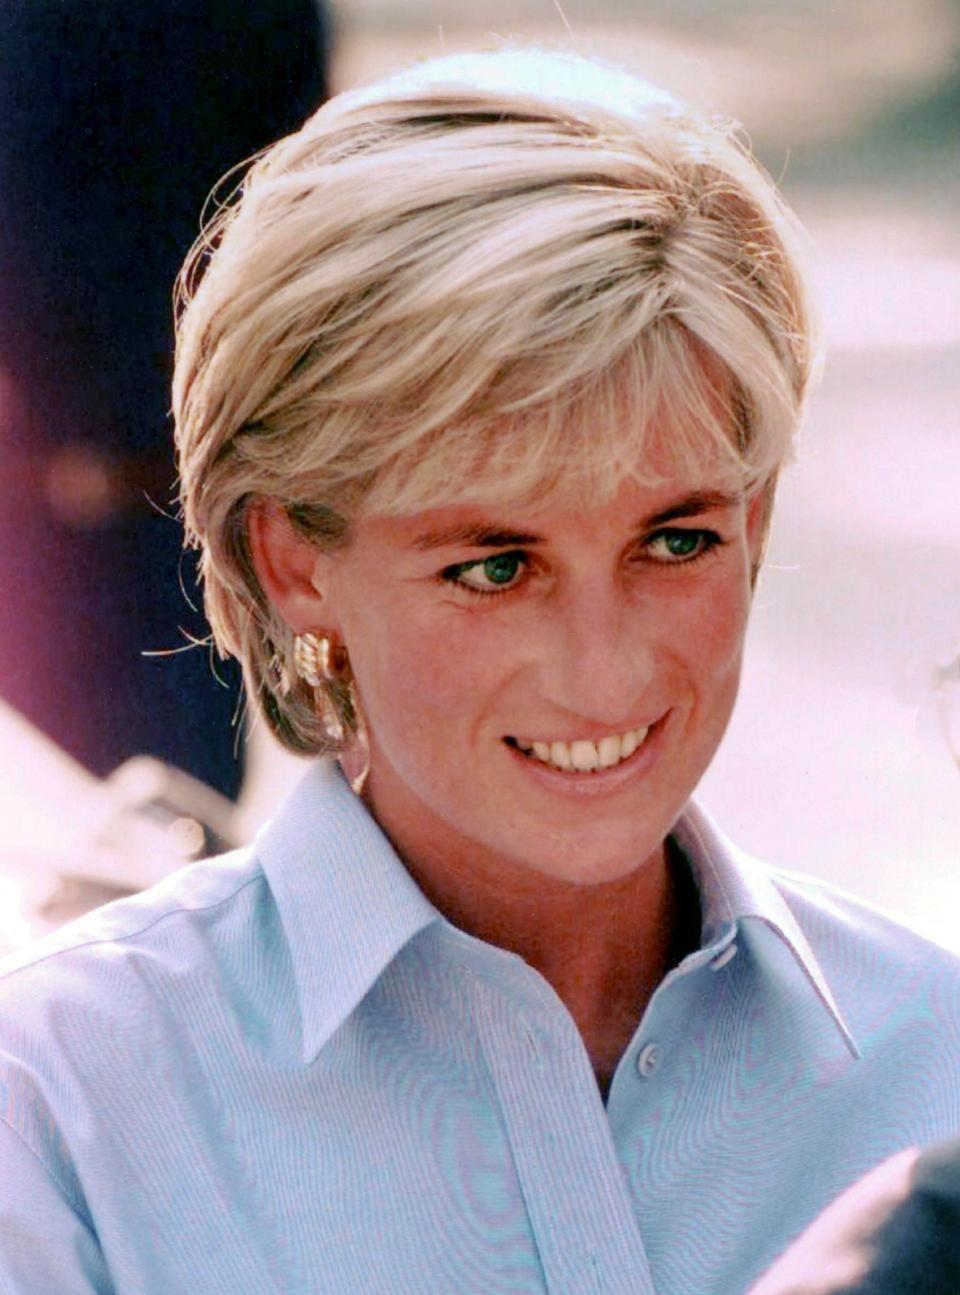 Sun Royal Photographer Arthur Edwards Tells How He First Got Diana